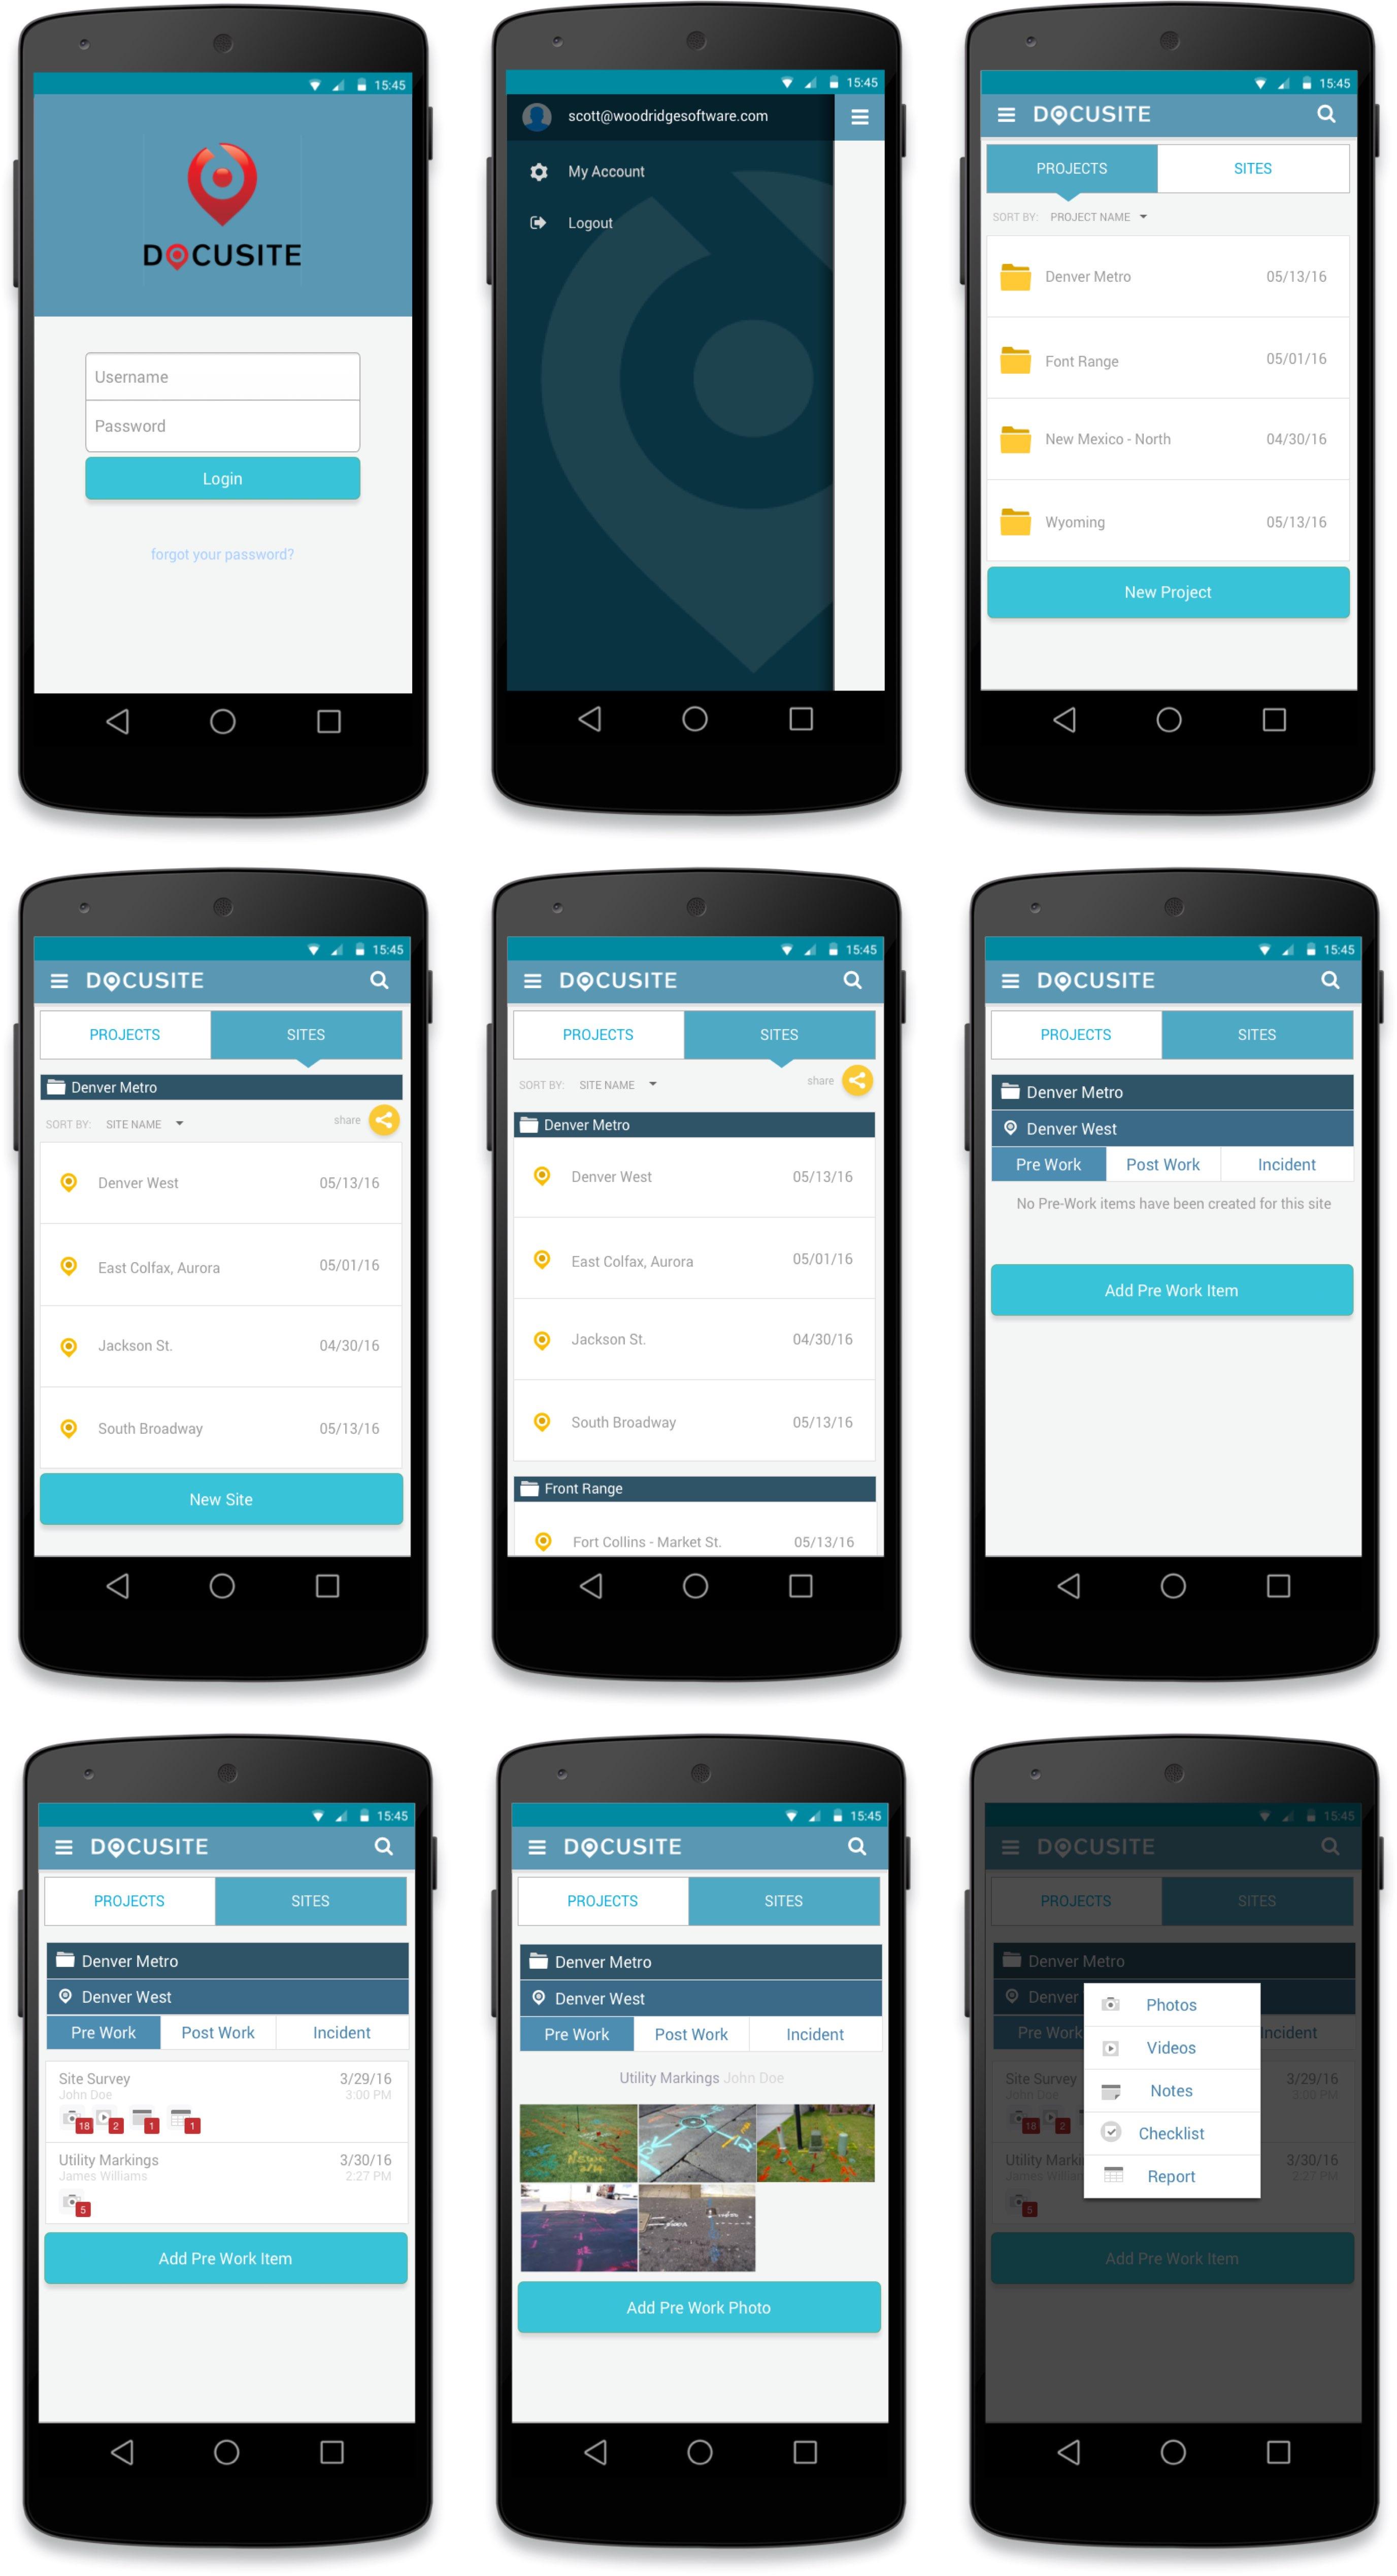 Docusite Android Screens